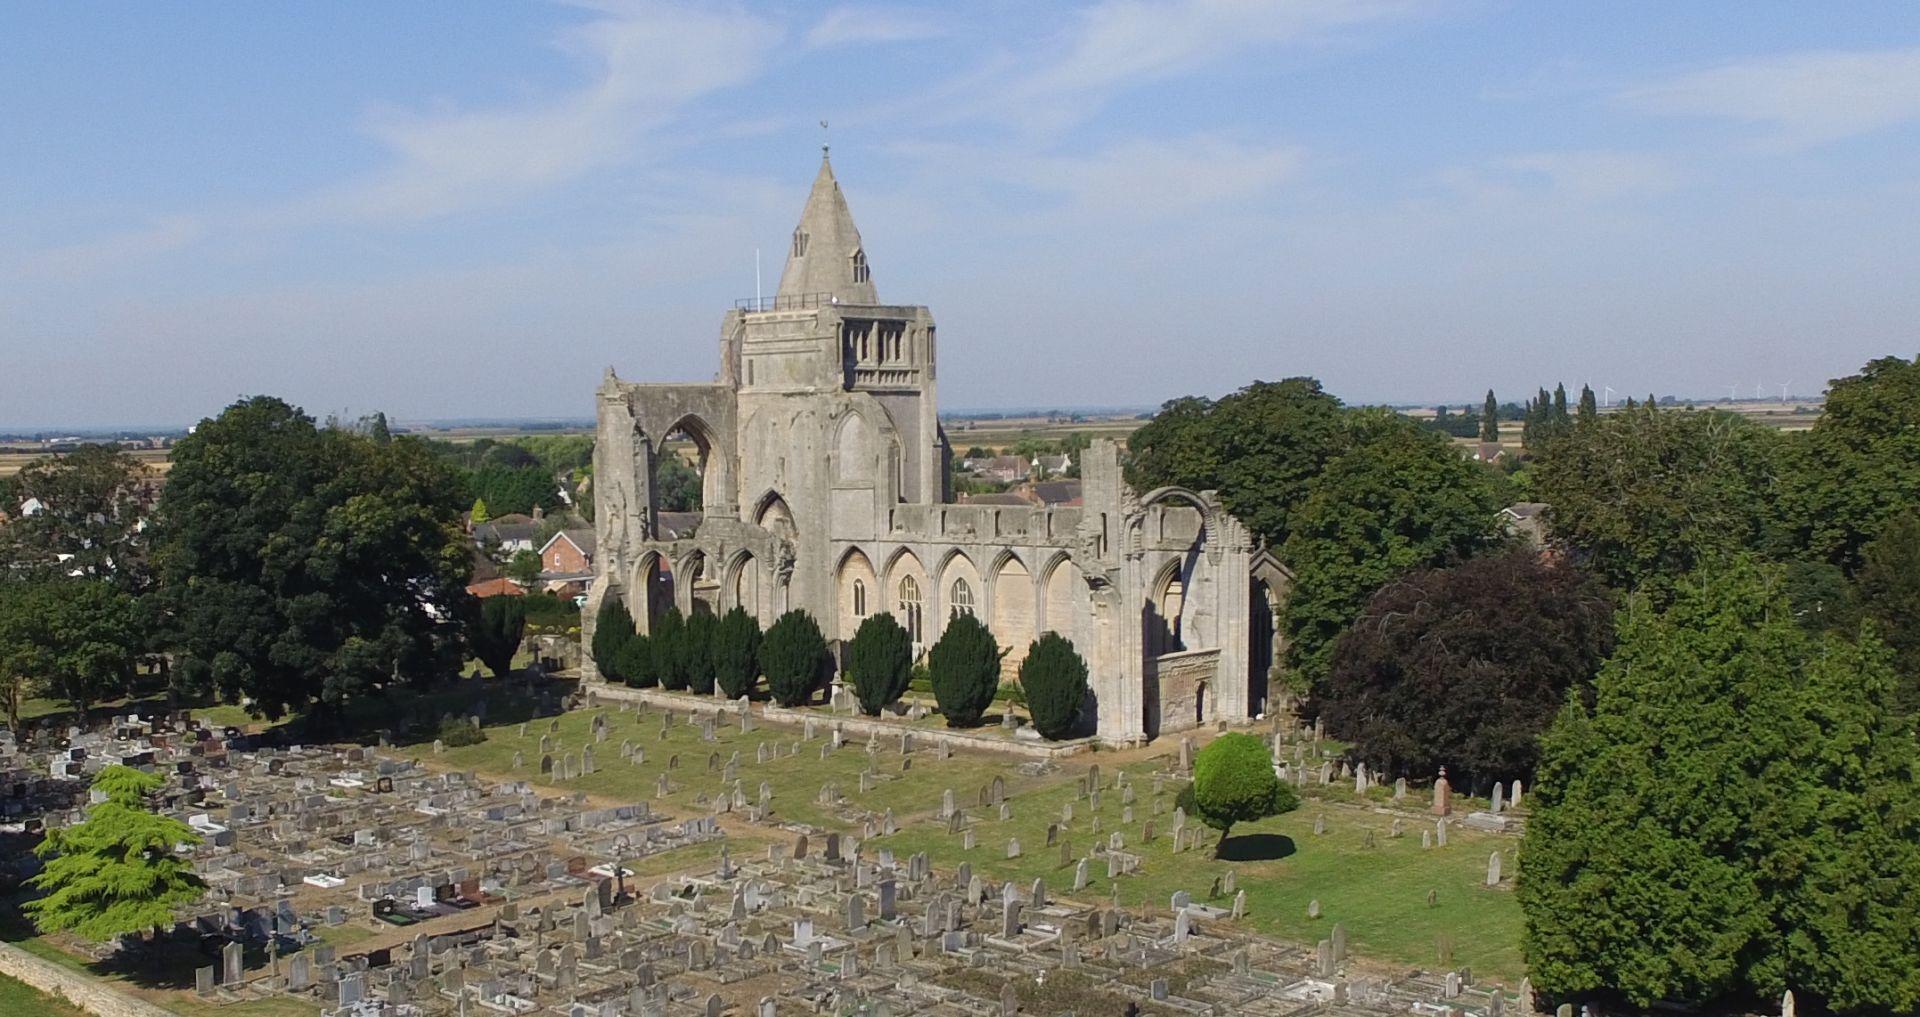 Church - Large